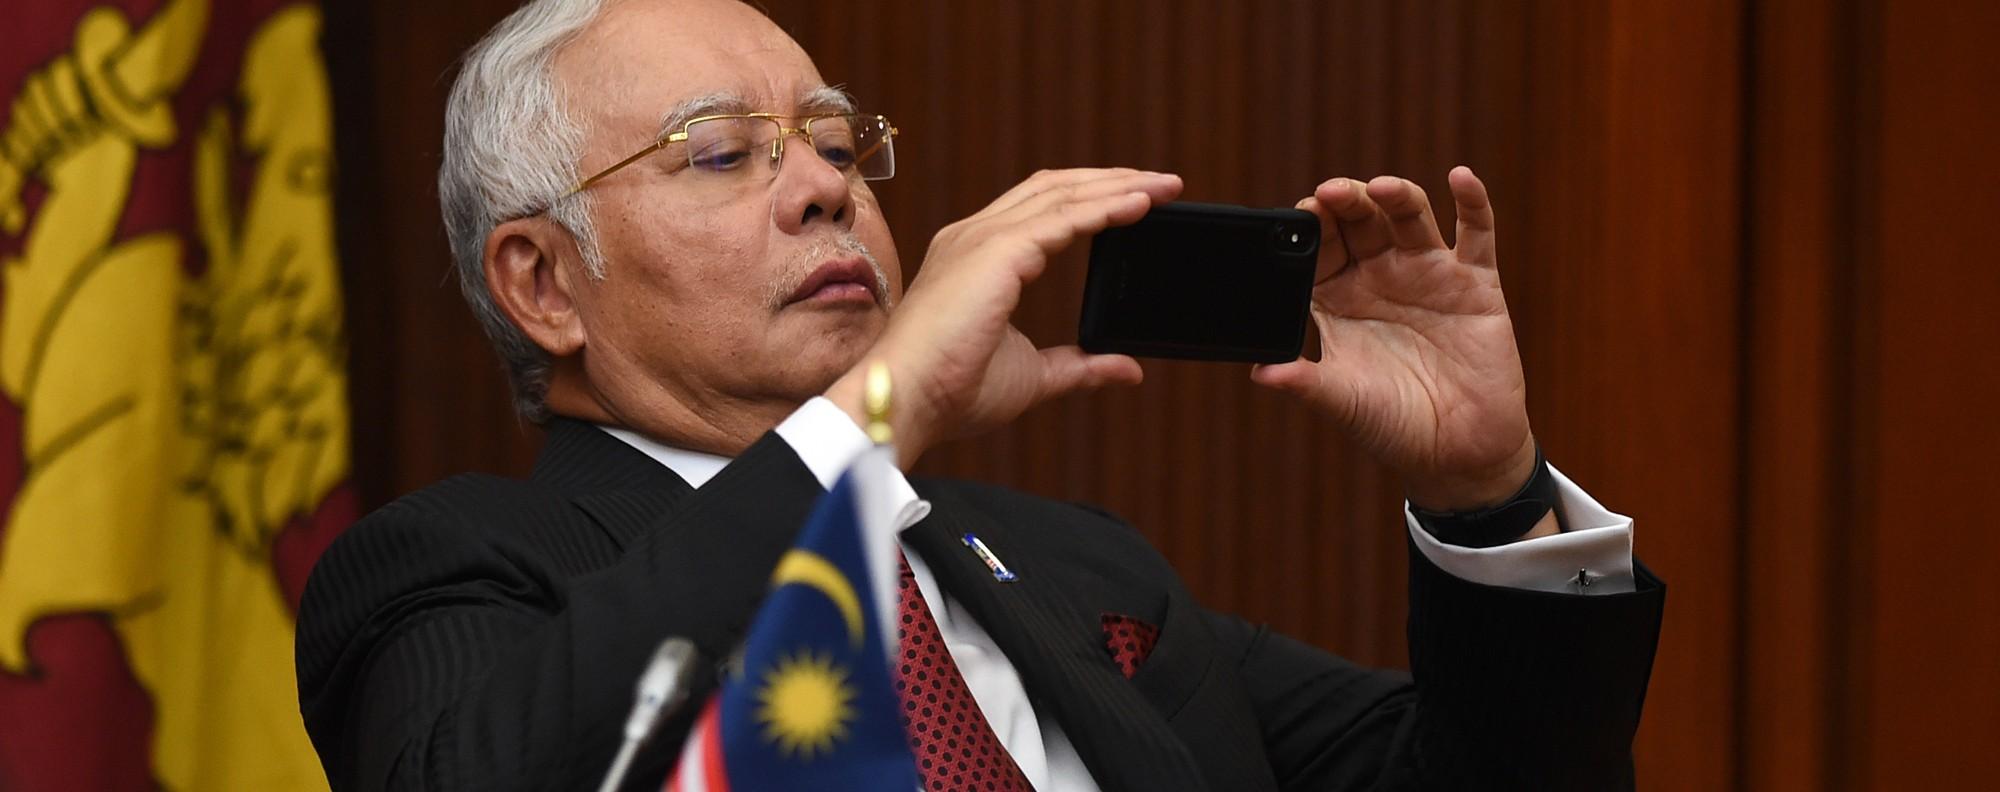 Malaysian Prime Minister Najib Razak. Photo: AFP